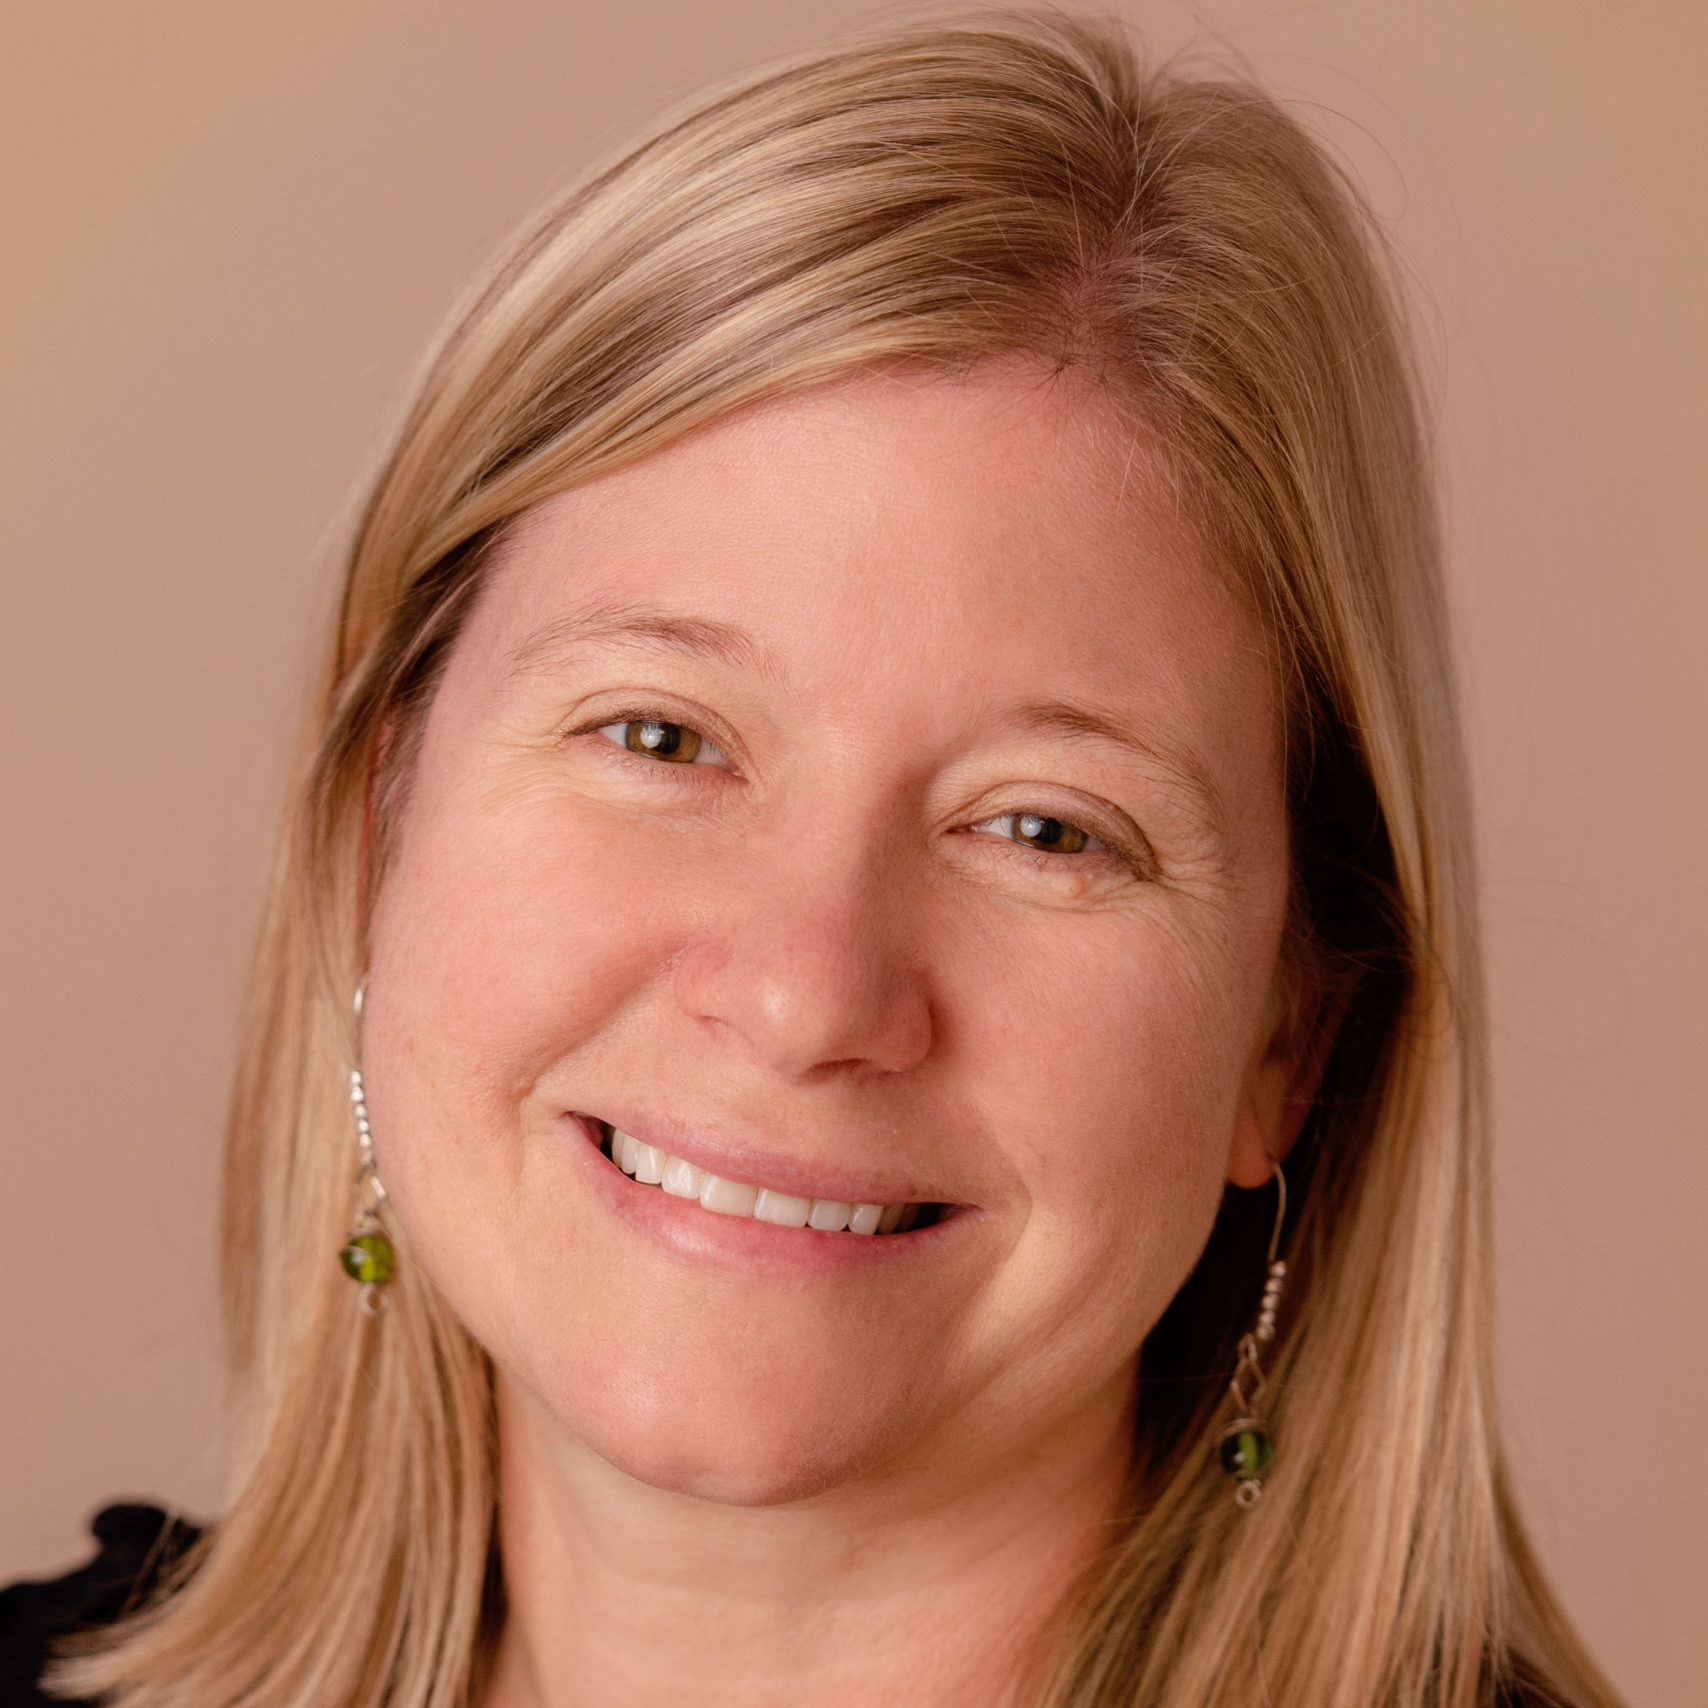 Ms. Erica Belois-Pacer